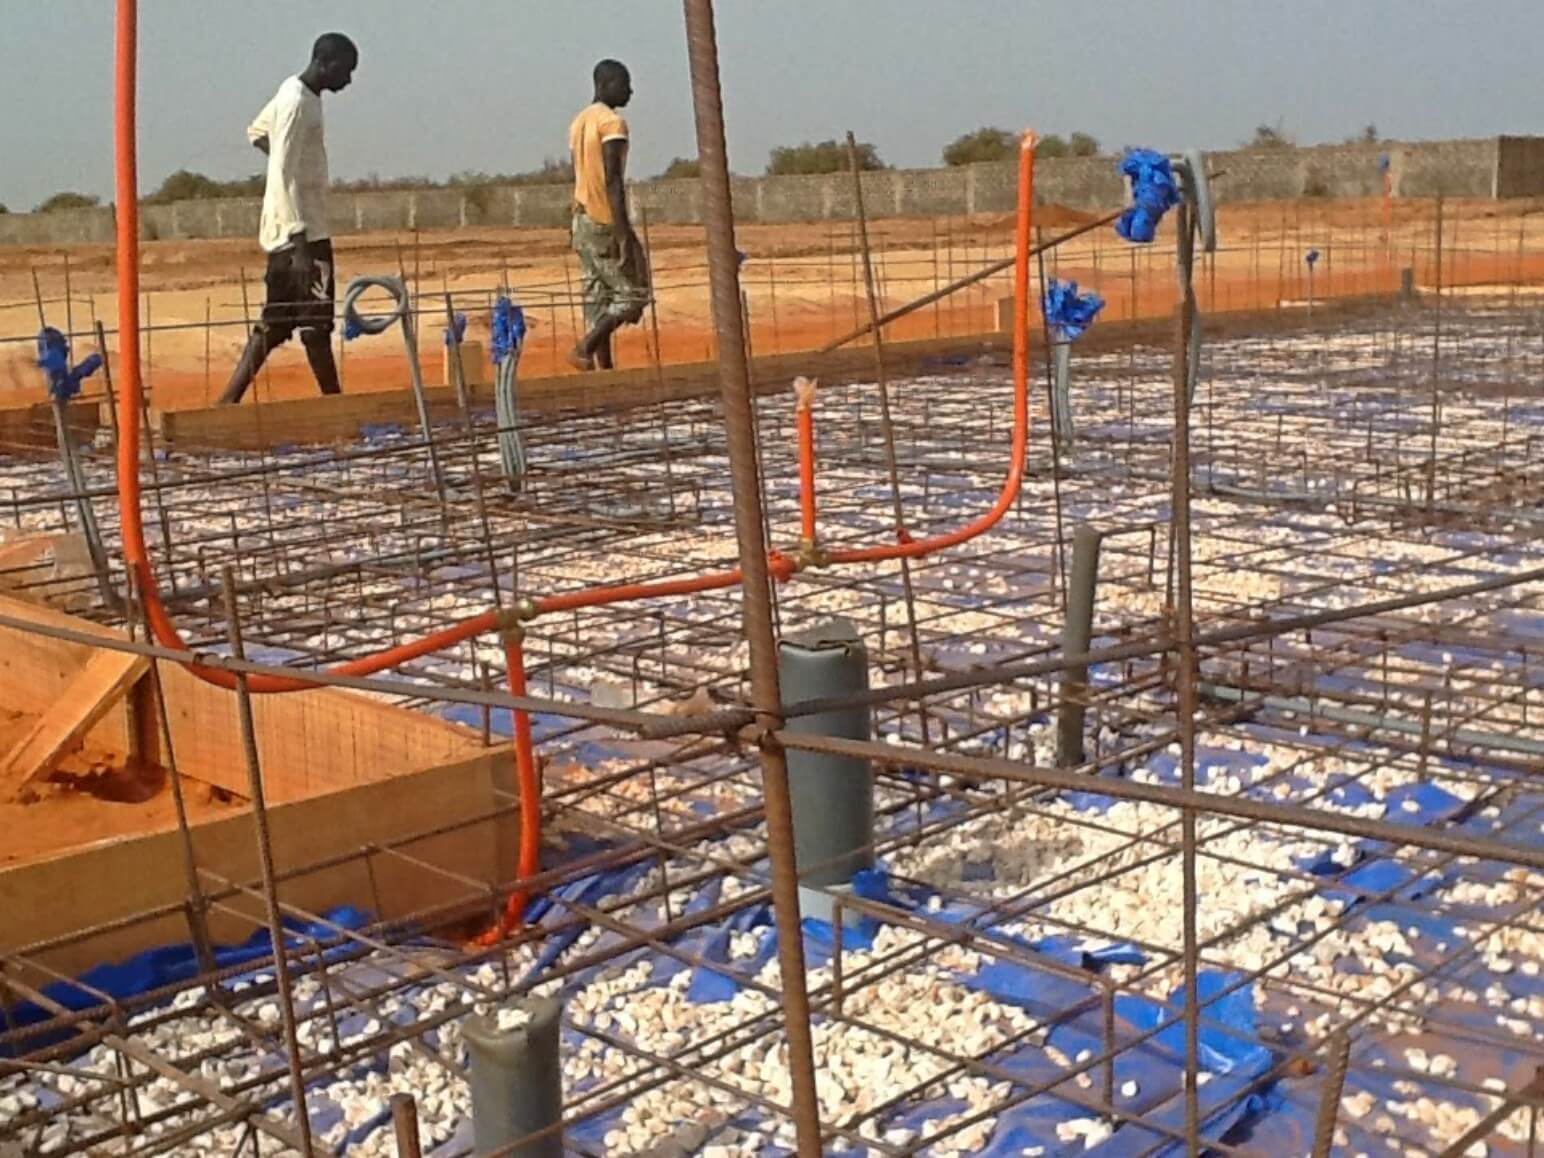 proyecto senegal encofrados de aluminio construccion strong forms alicante 11